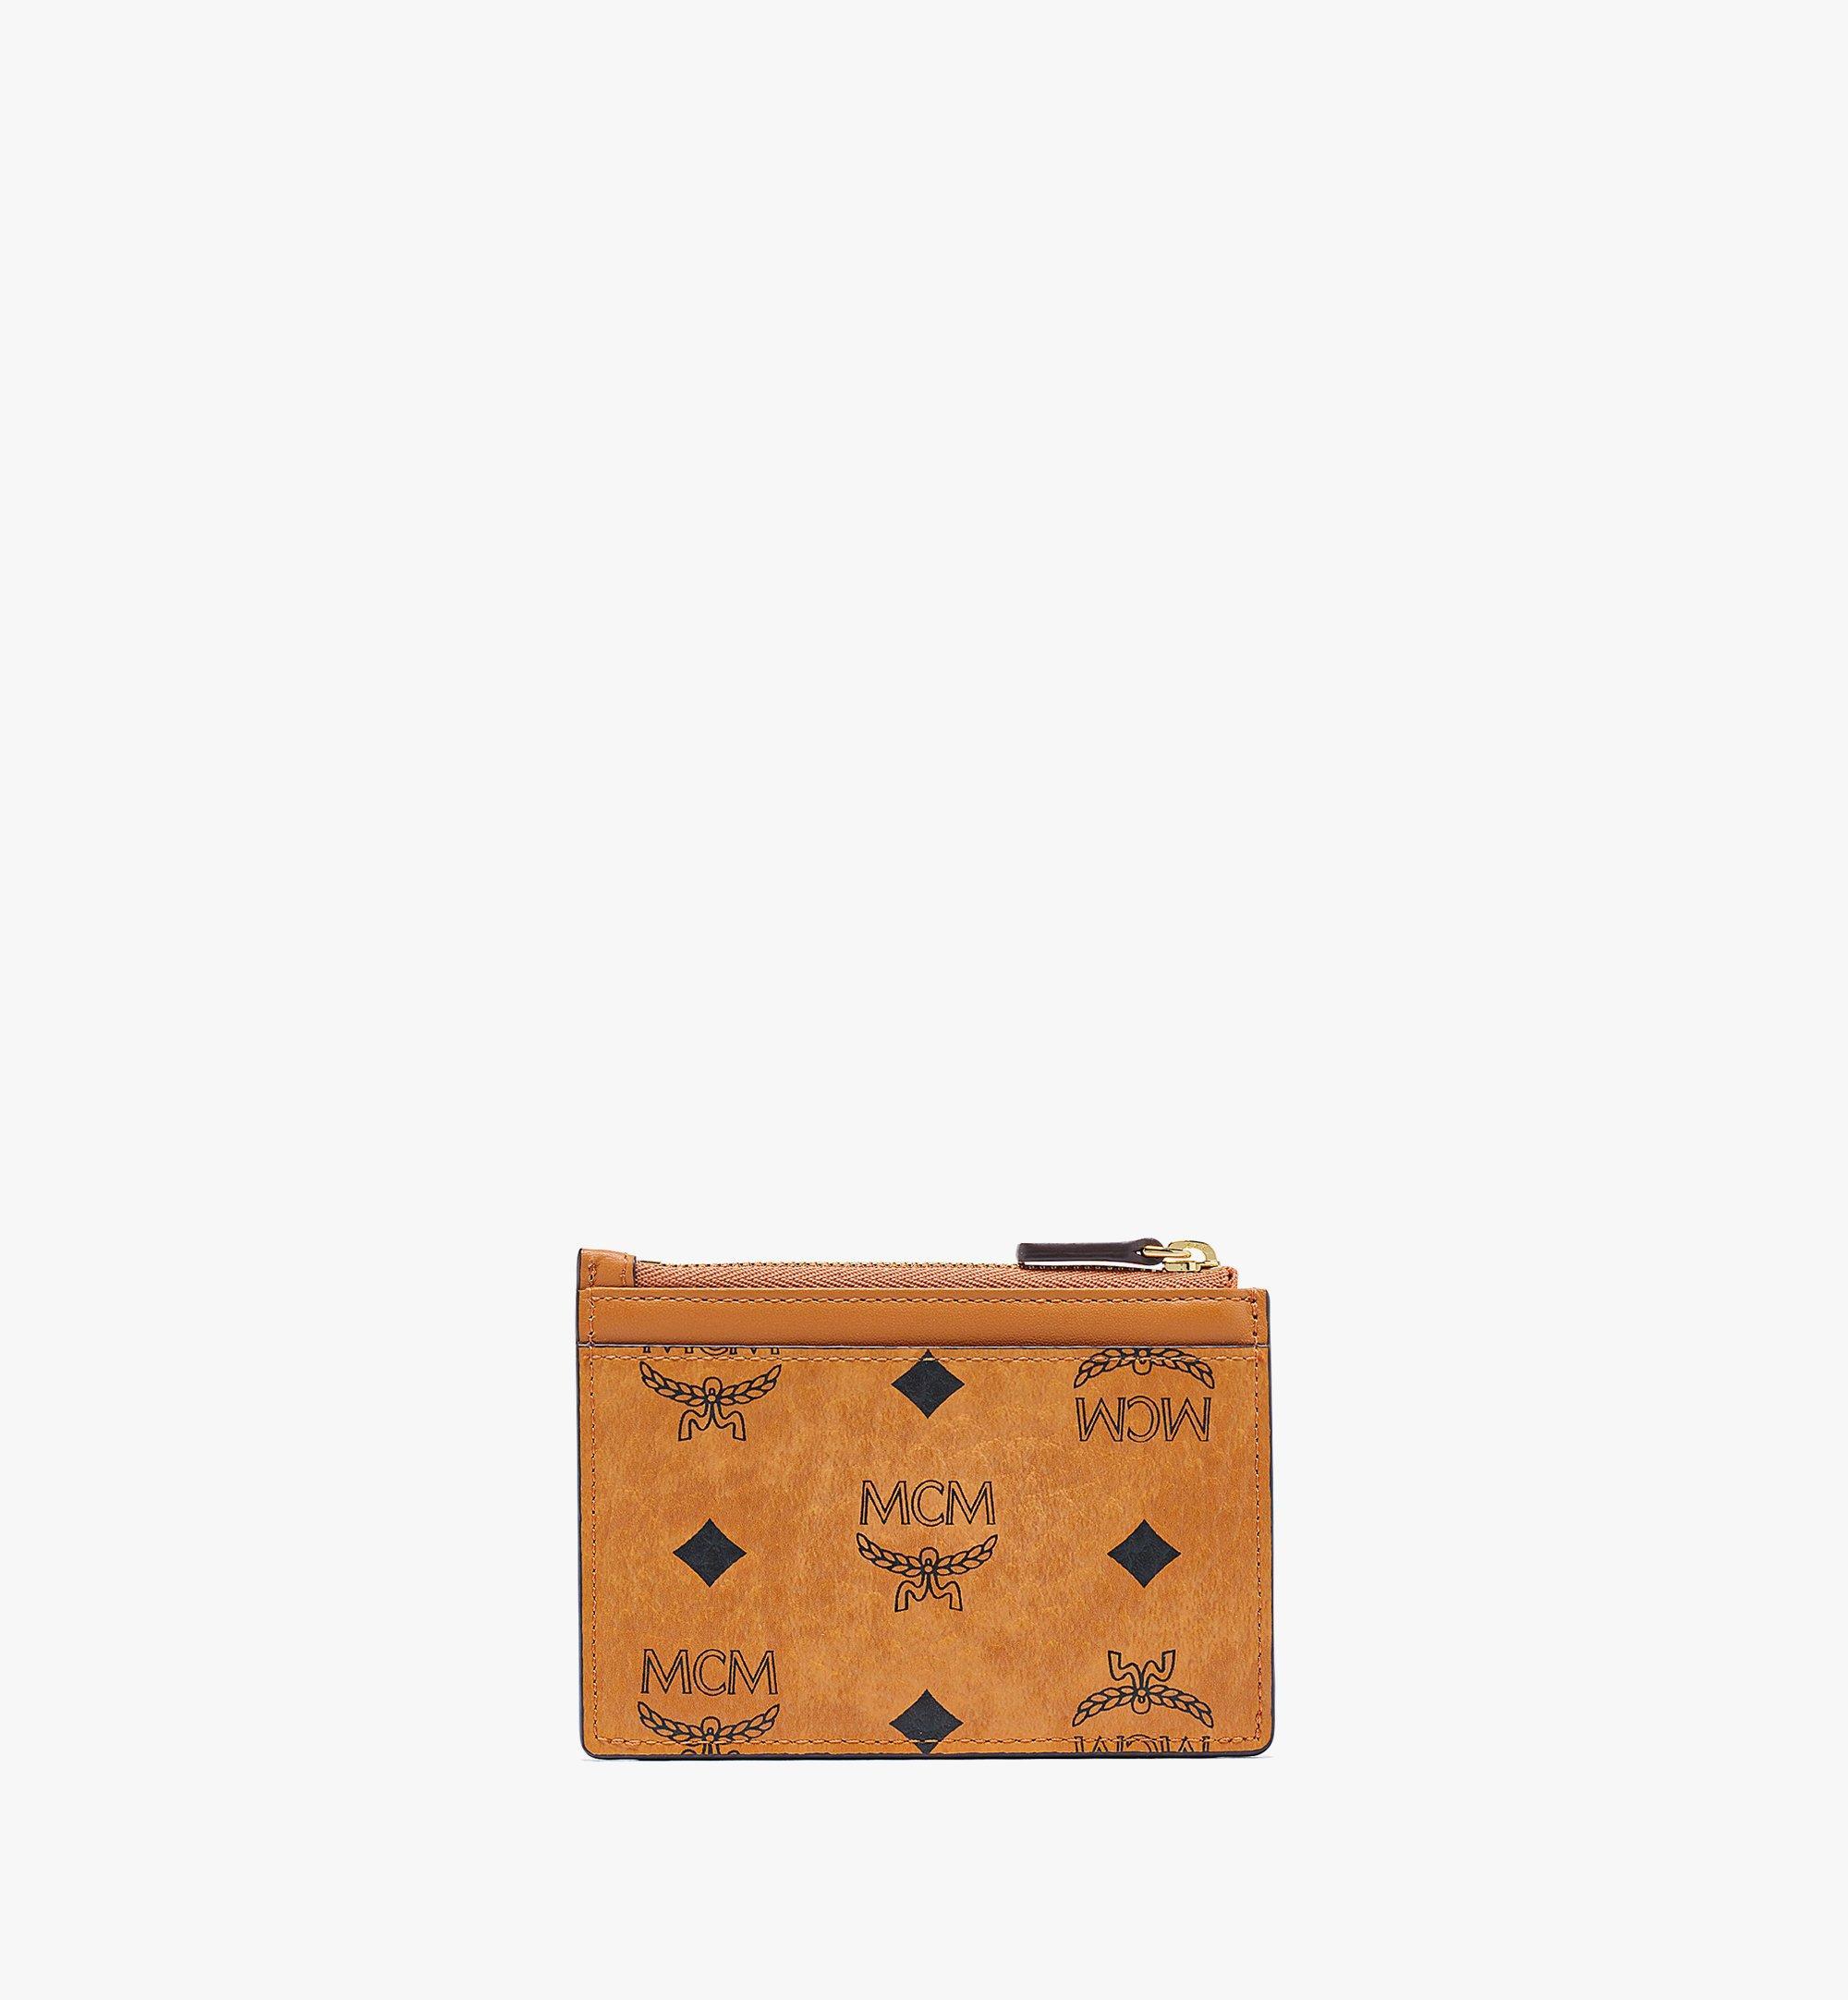 MCM 패트리샤 비세토스 지퍼 카드 케이스 Cognac MYABSPA07CO001 다른 각도 보기 2